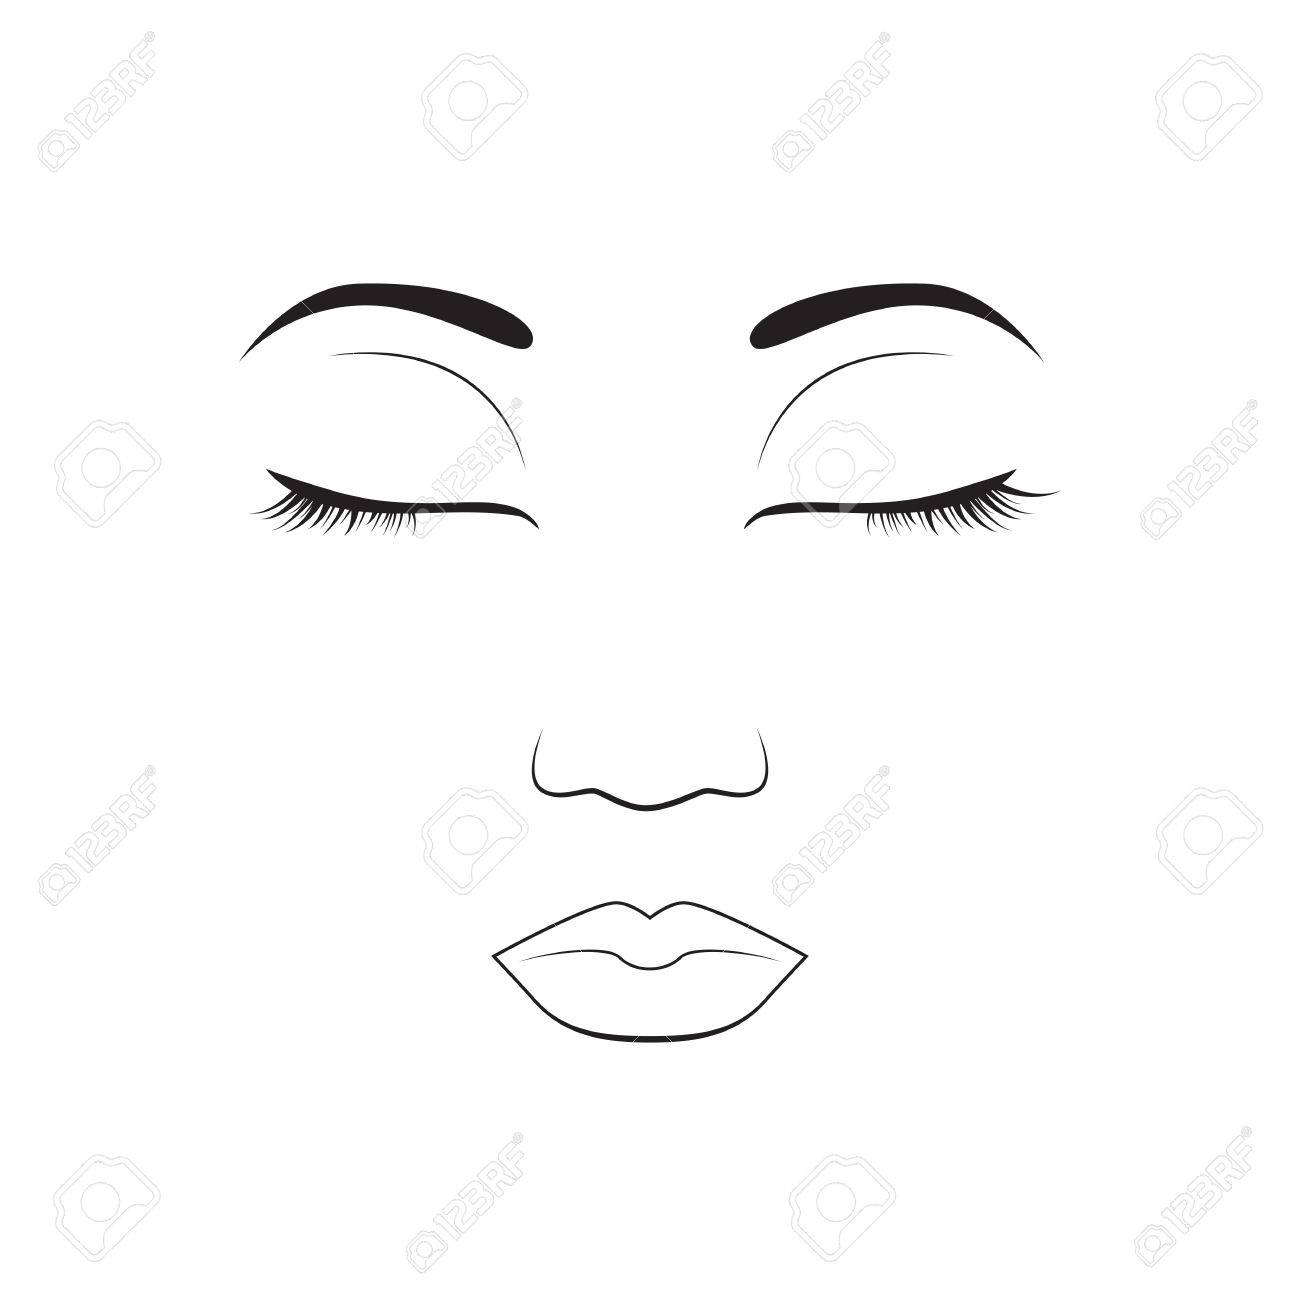 Girl Emotion Face Sleep Cartoon Vector Illustration And Woman